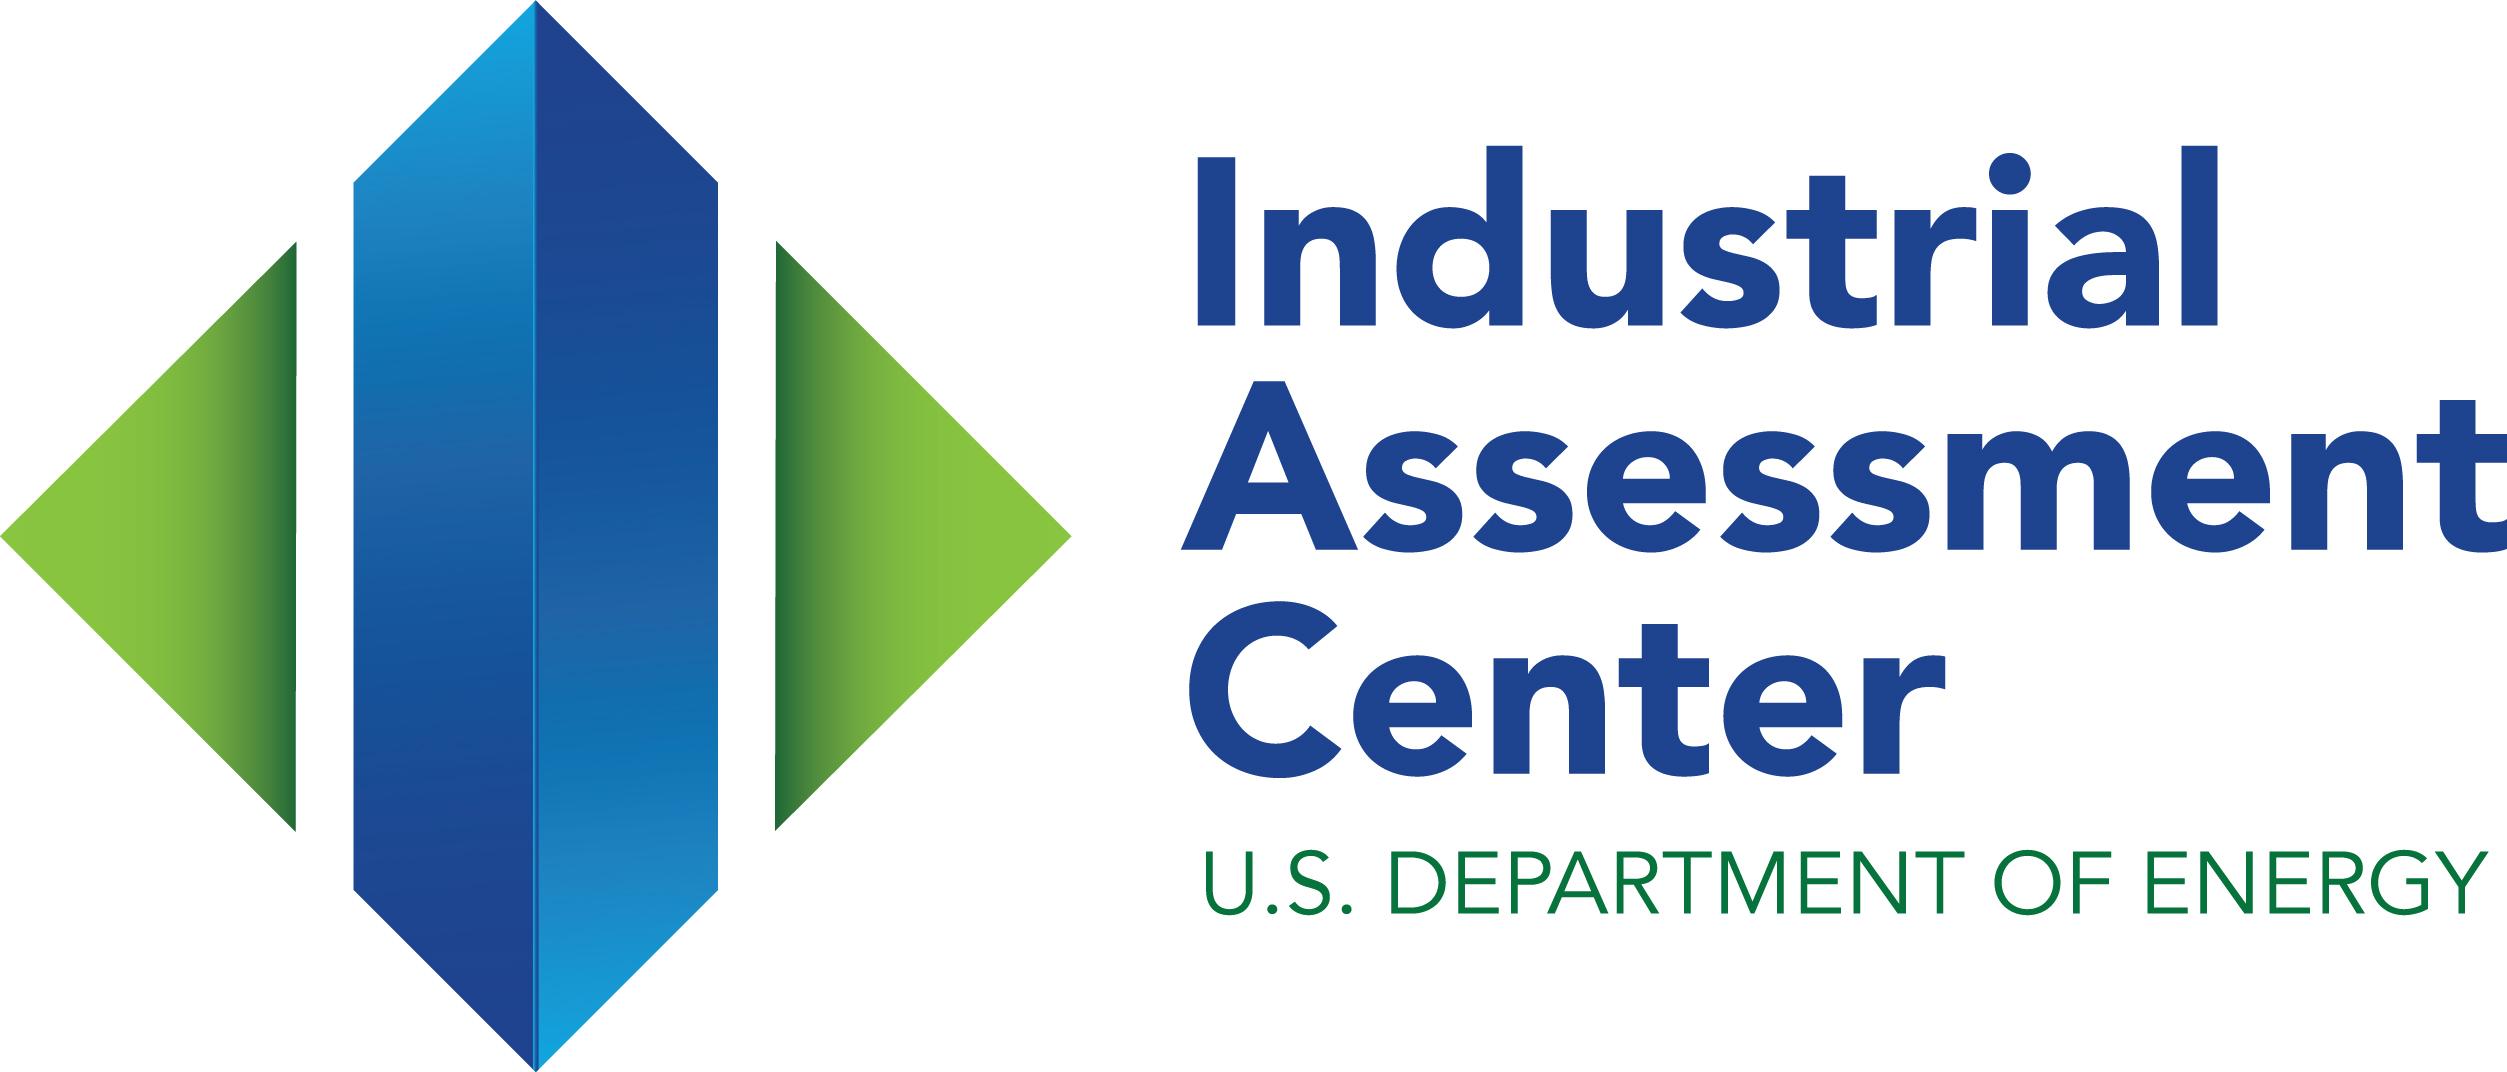 Asu Industrial Assessment Center Why do employers use assessment centres? asu industrial assessment center